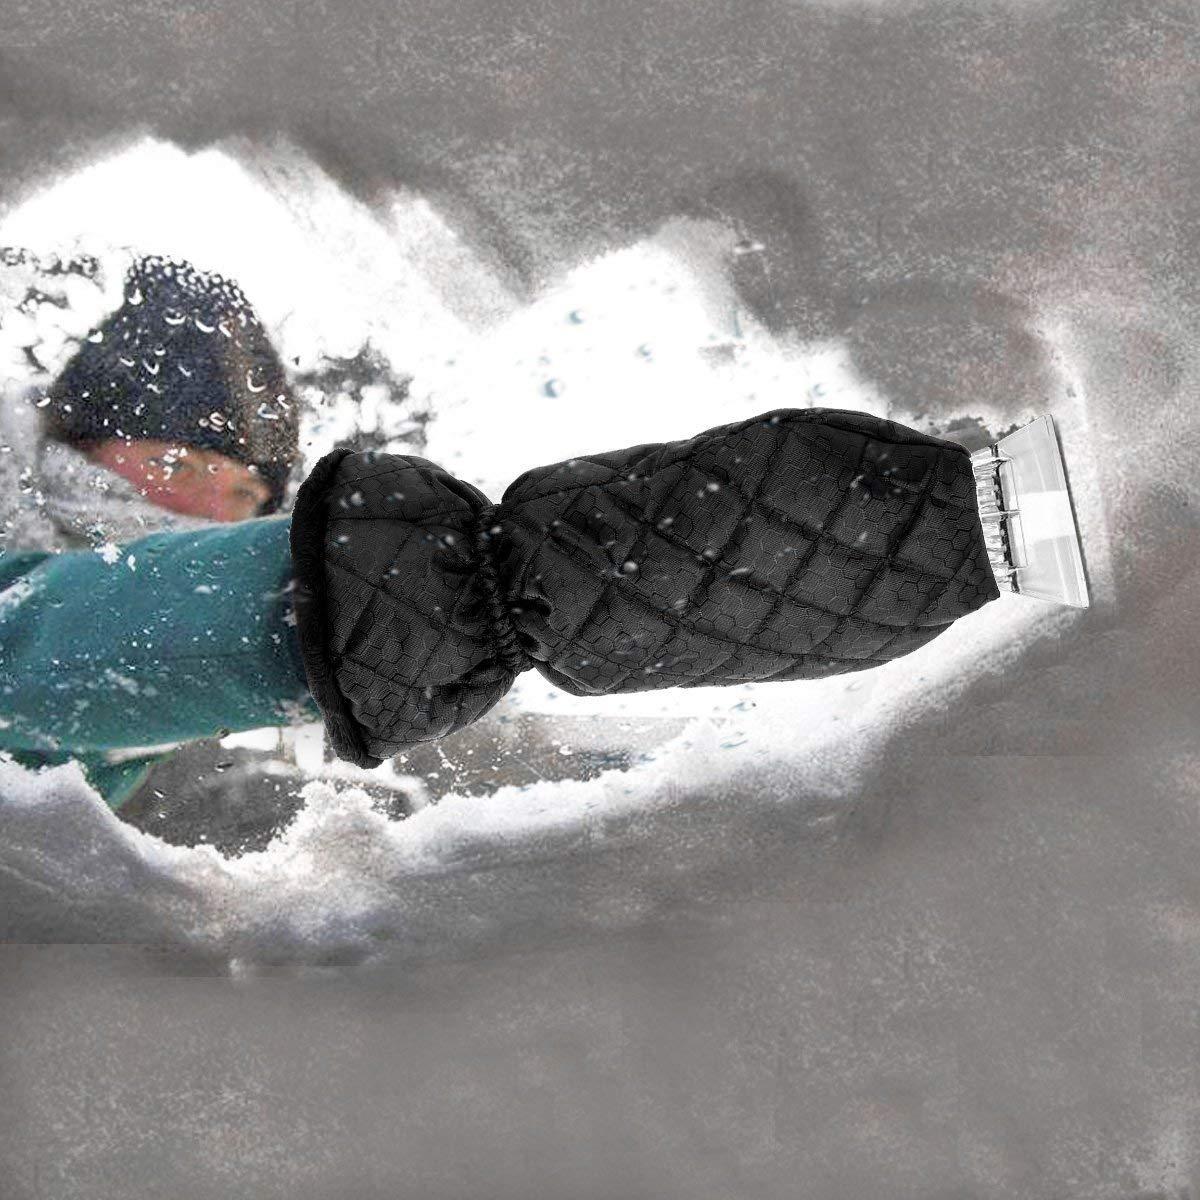 MATCC Ice Scraper for Car 2 Pack Windscreen Scraper with Glove Car Scraper Mitts with Waterproof Snow Remover Lined of Thick Fleece Window Scraper Black